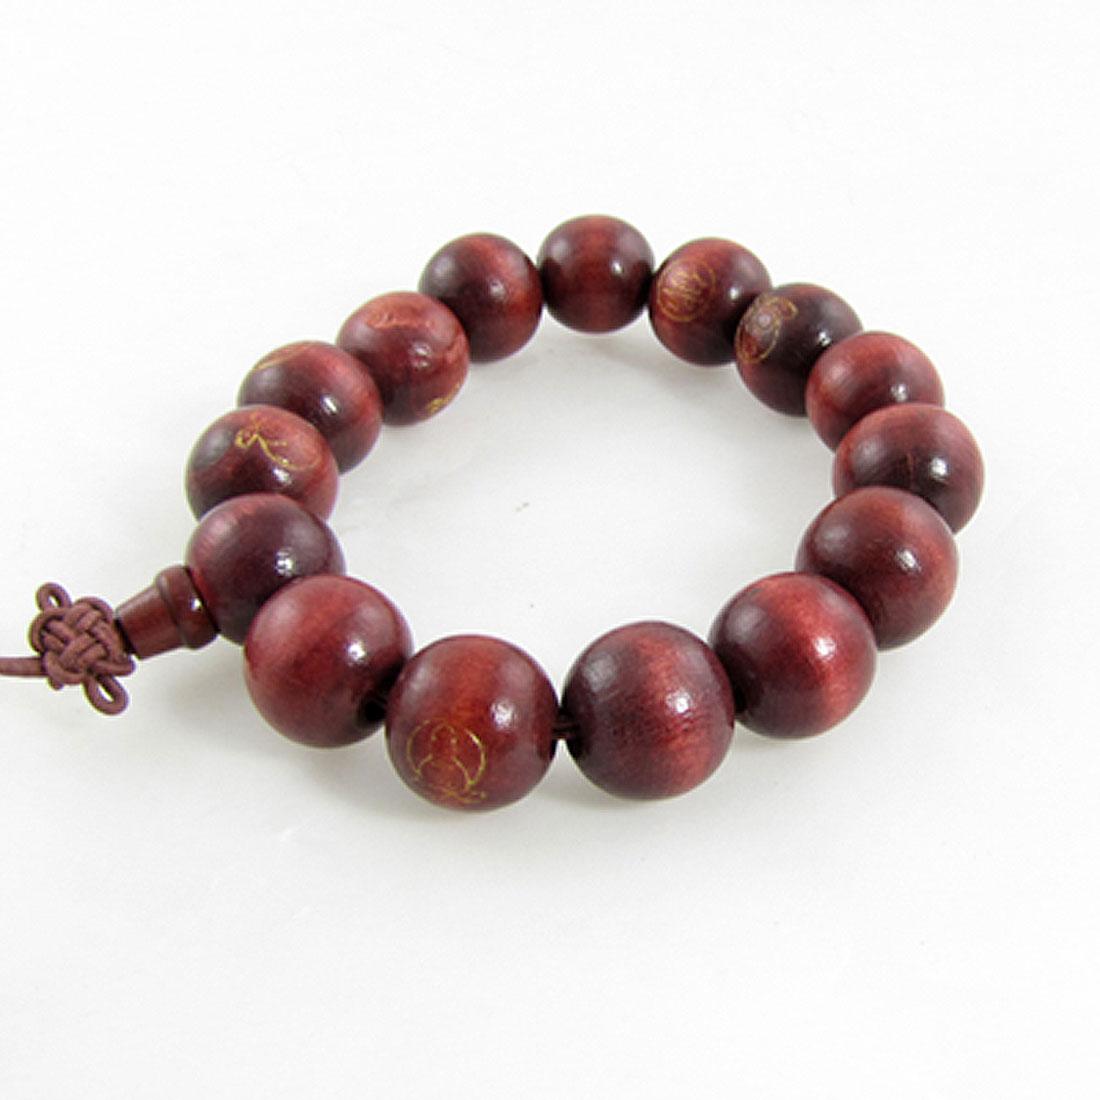 Wine Red Wooden Buddhist Prayer Beads Wrist Mala Bracelet